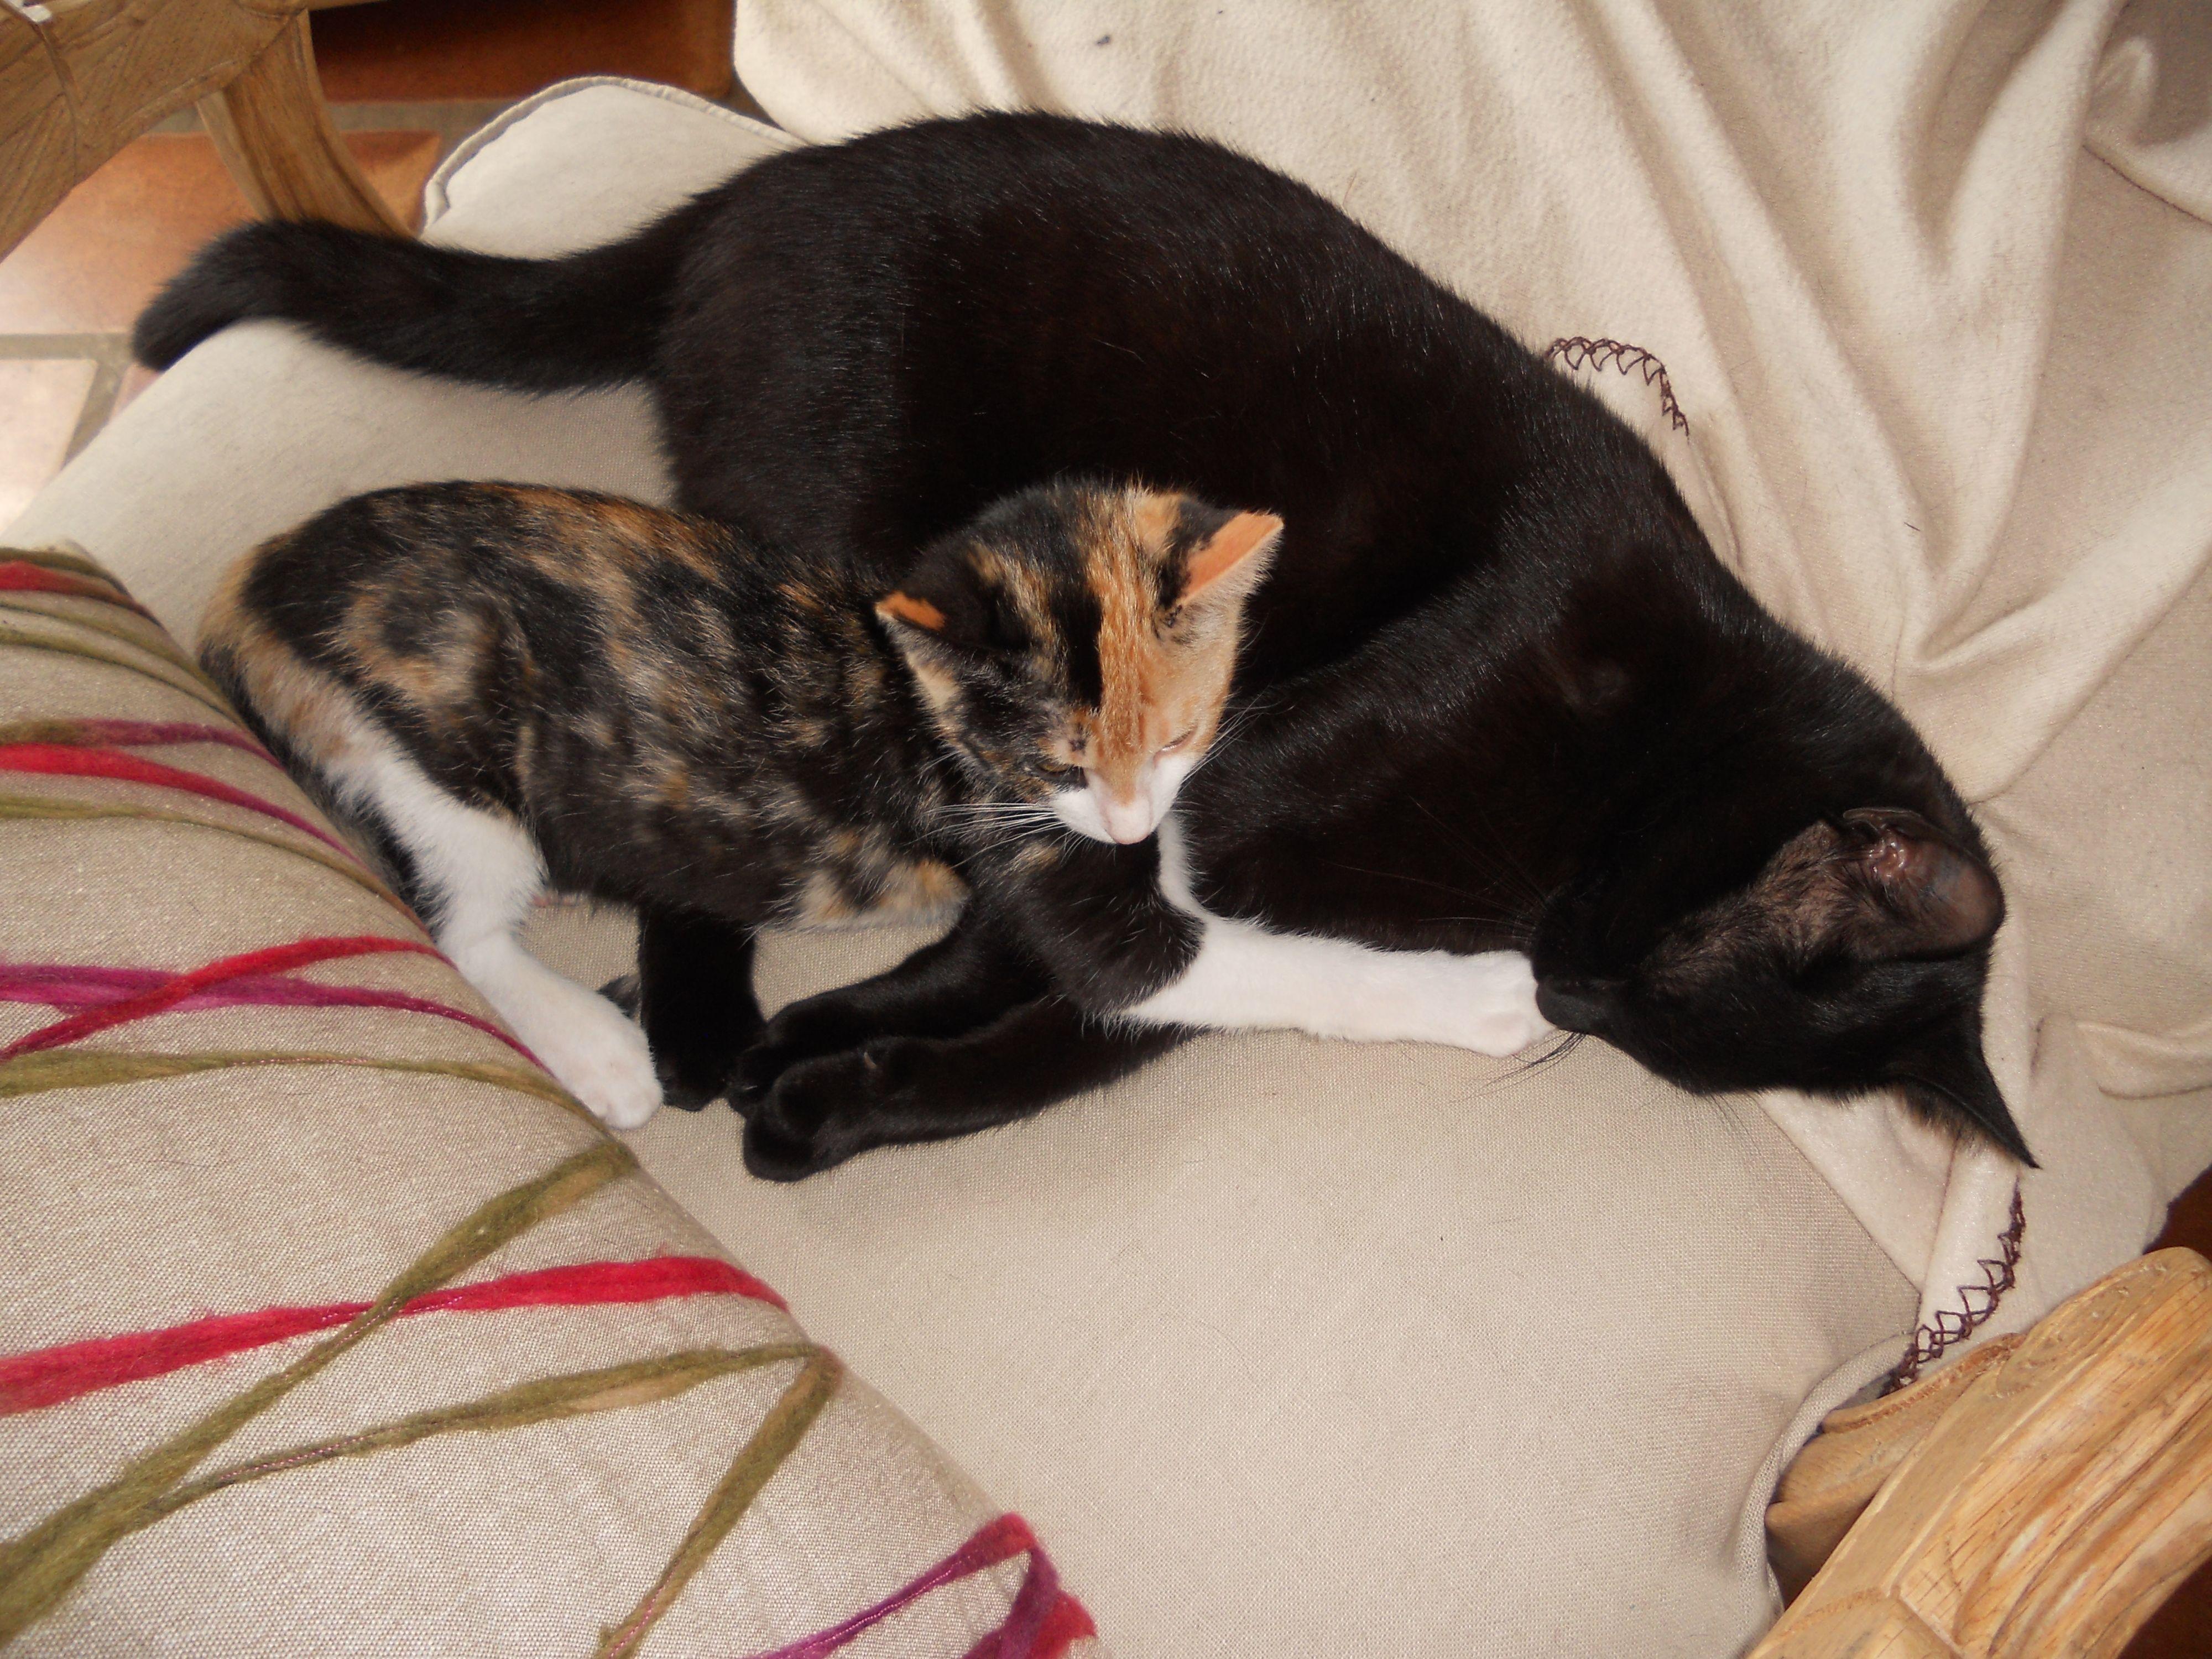 Gaîa, le pot de colle #chat #chaton #cat #chambredhote #bandb #cute #mignon #tarn #castelnaudemontmiral #gaillac http://lamaisonduchai.com/accueil.html